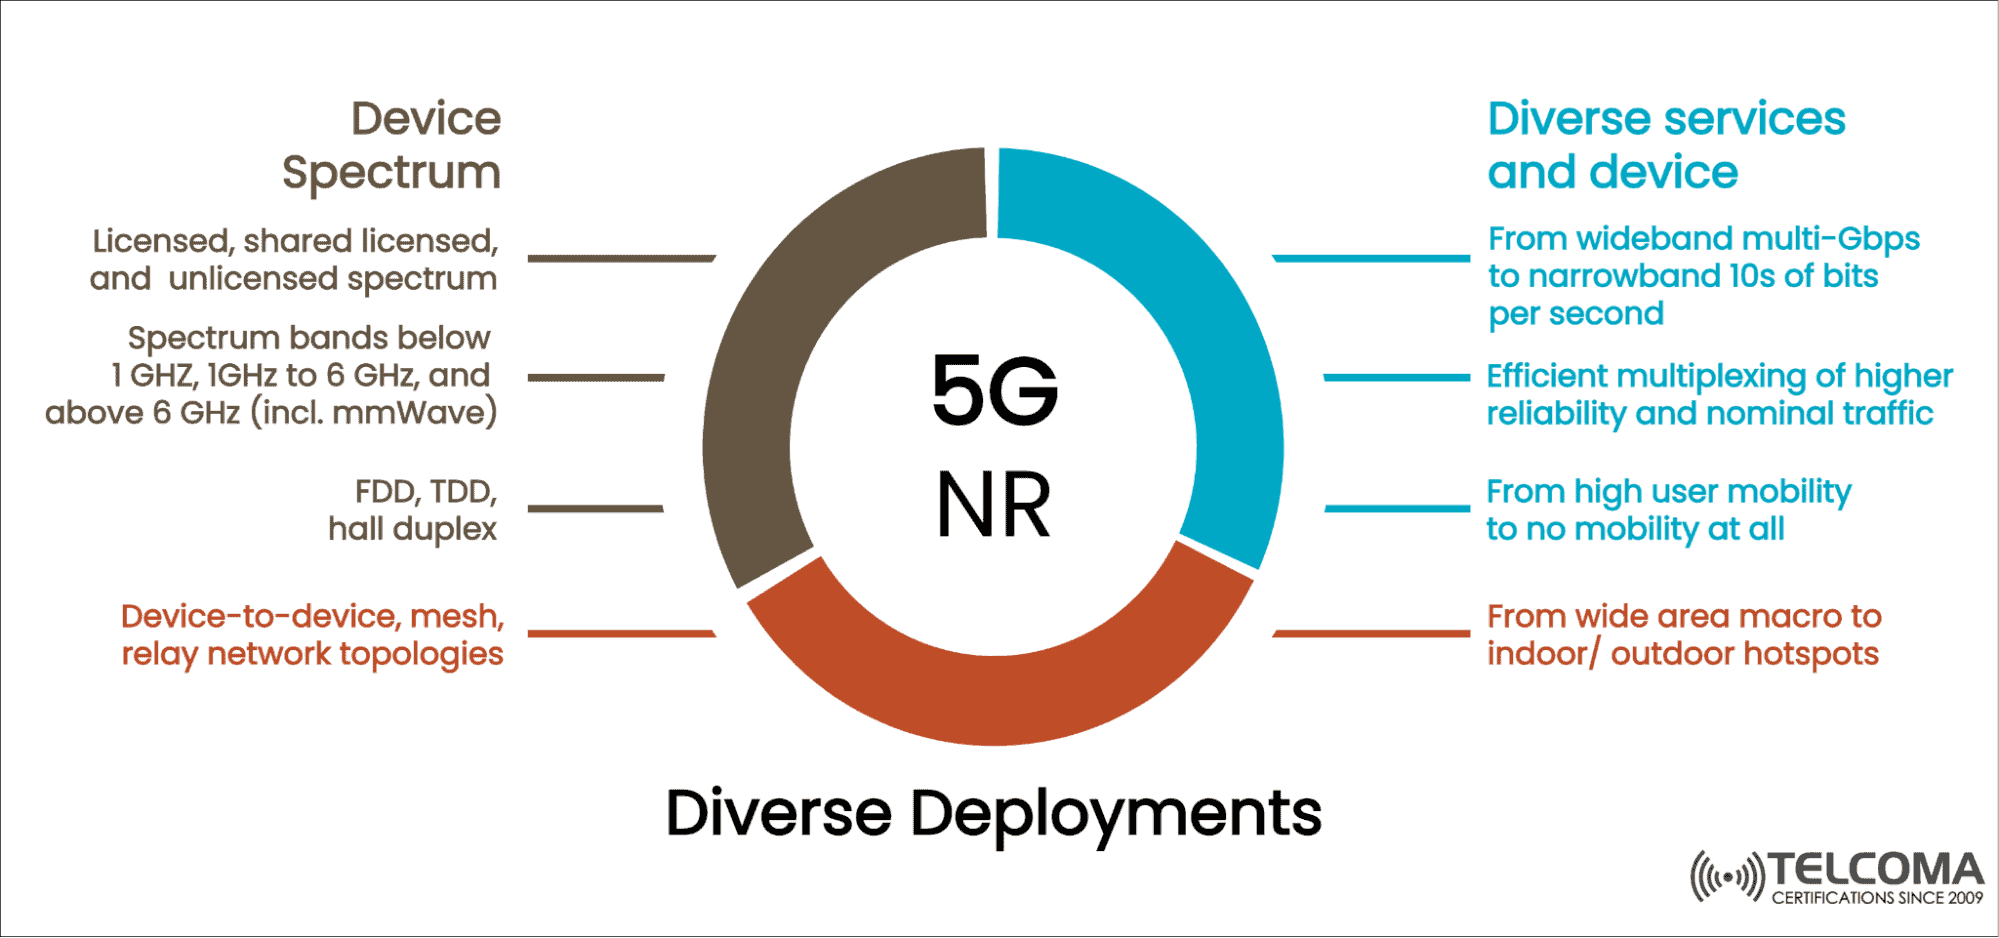 5g nr diverse deployments